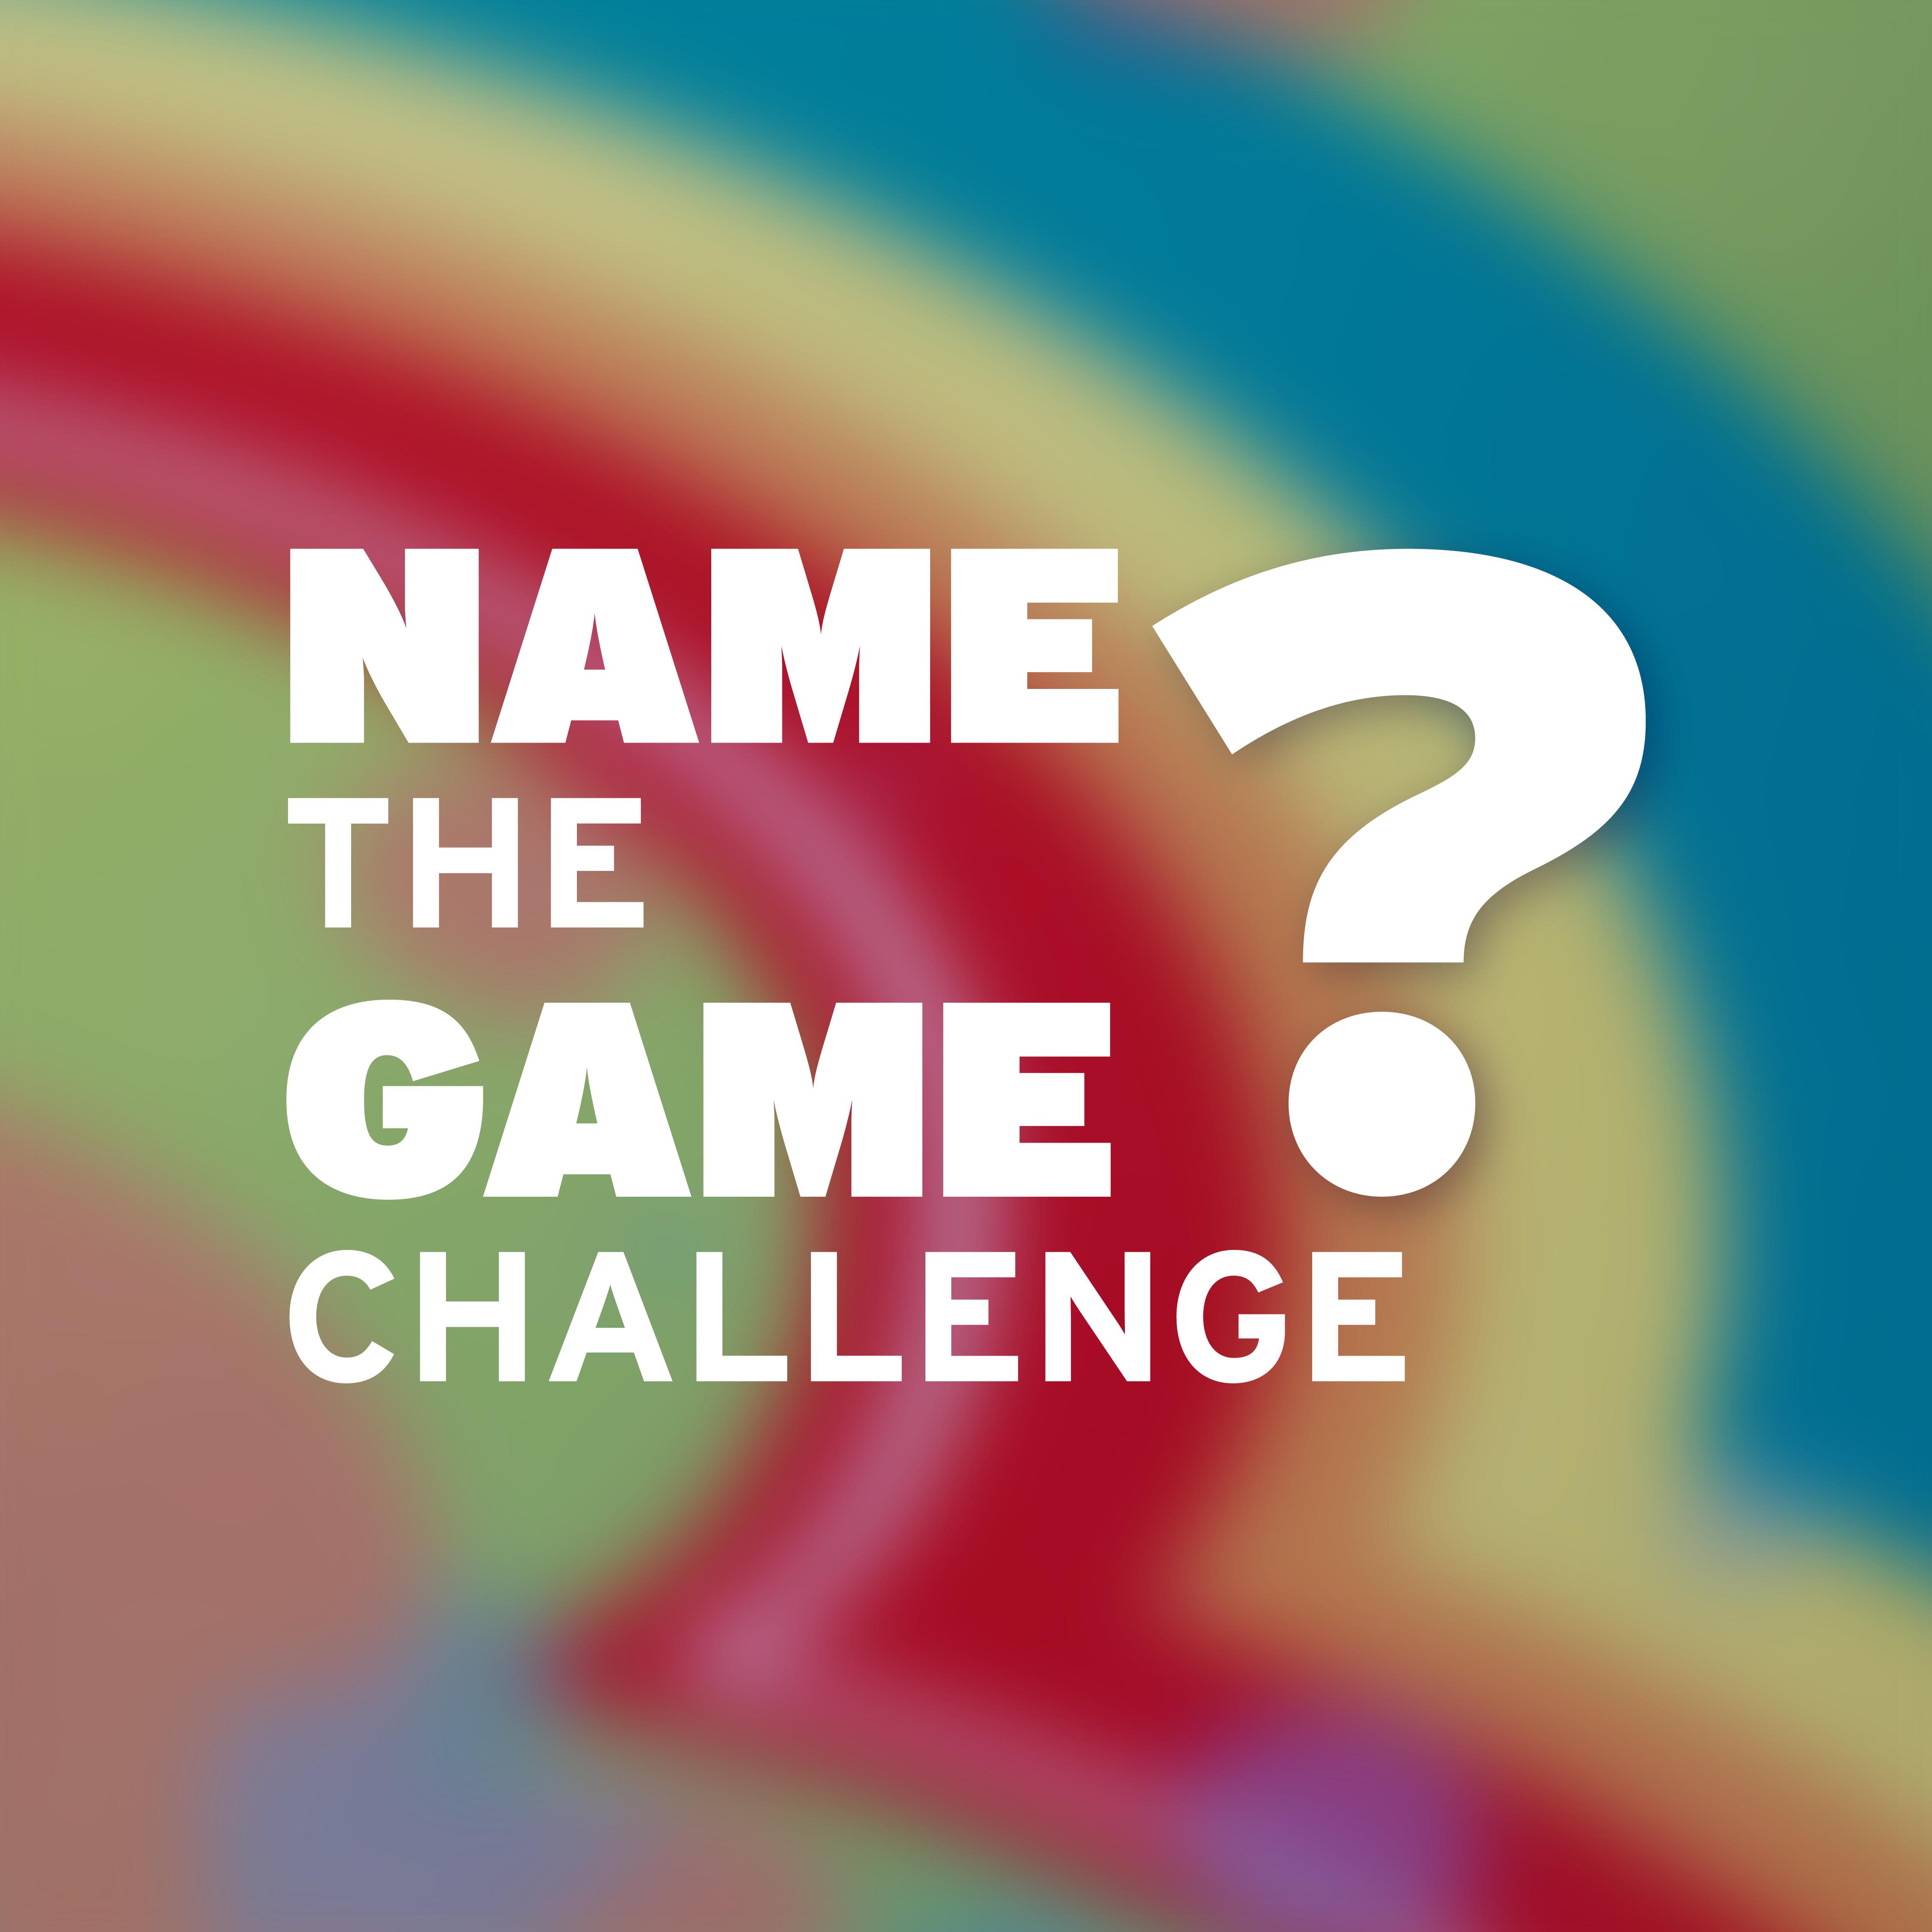 Name the Game Challenge